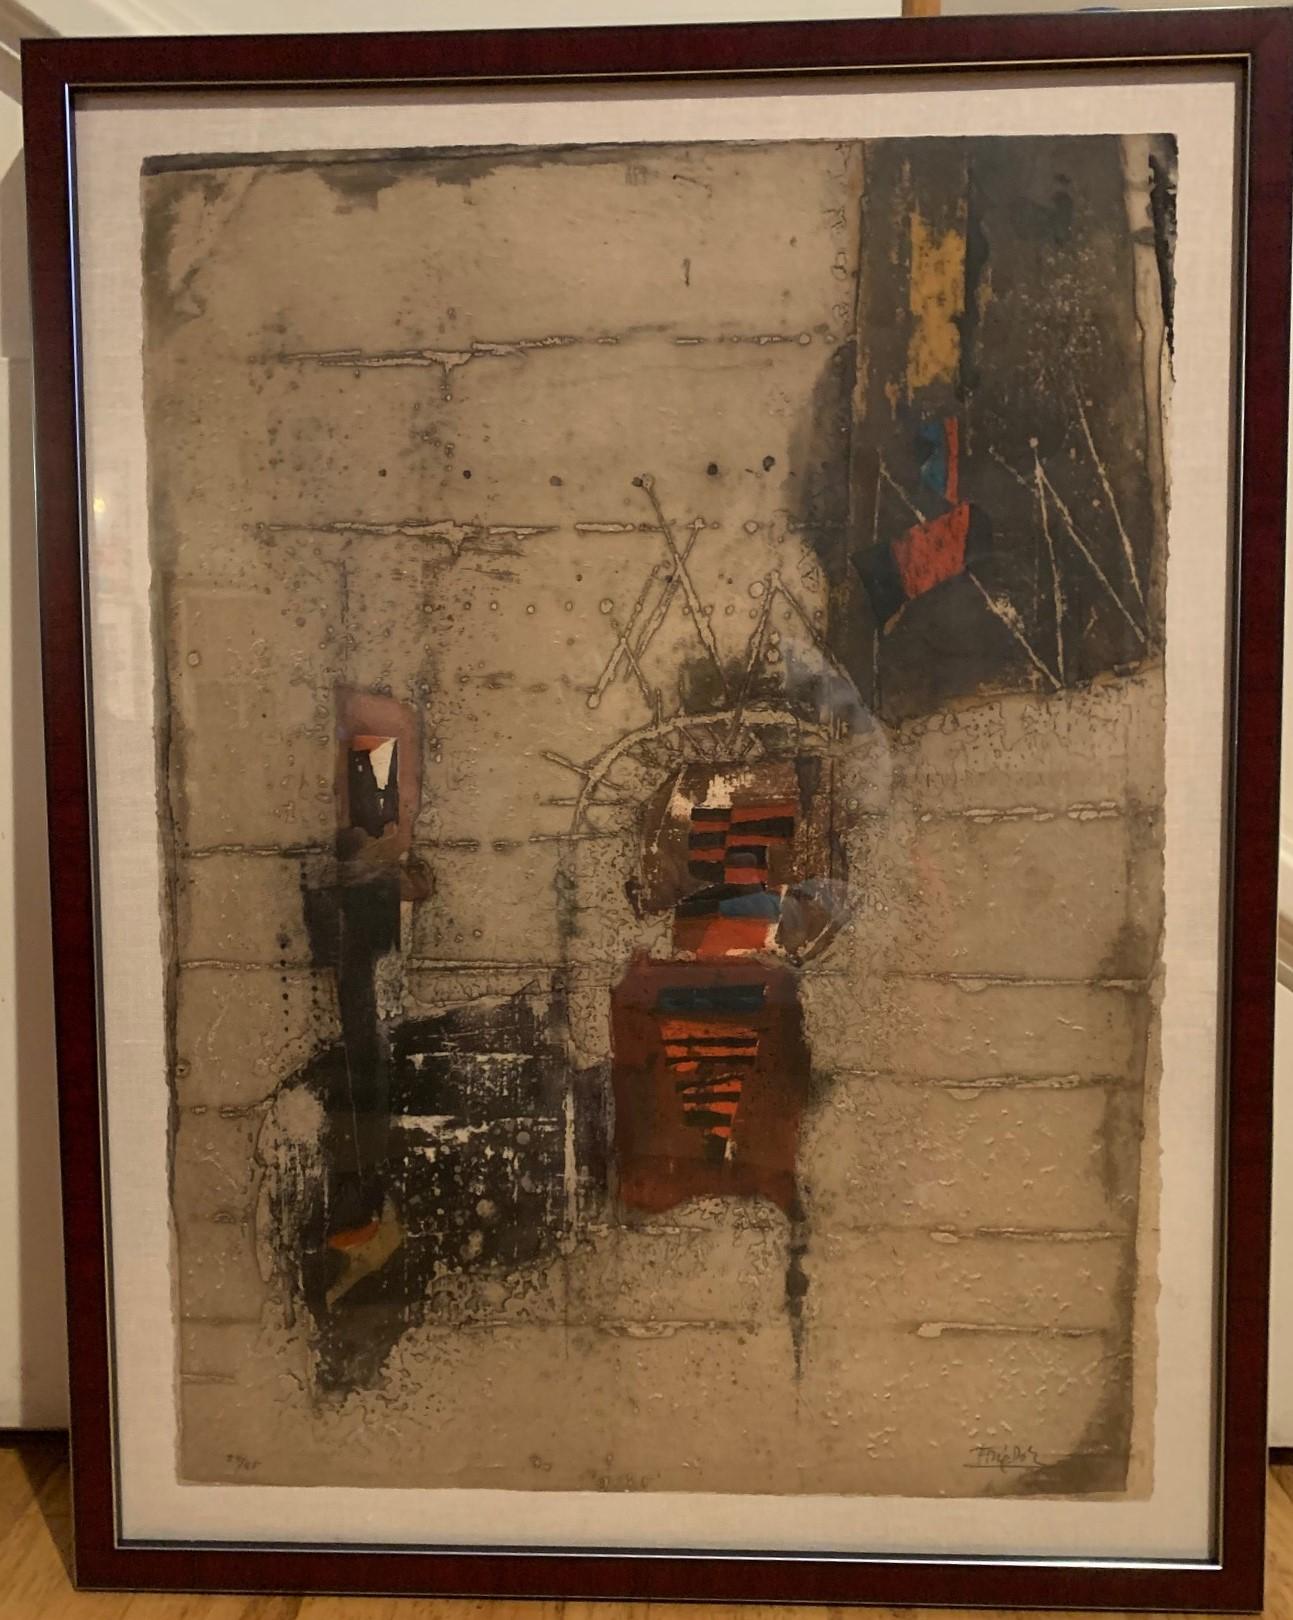 Dedicace (Dedication) by  Johnny FRIEDLAENDER - Masterpiece Online